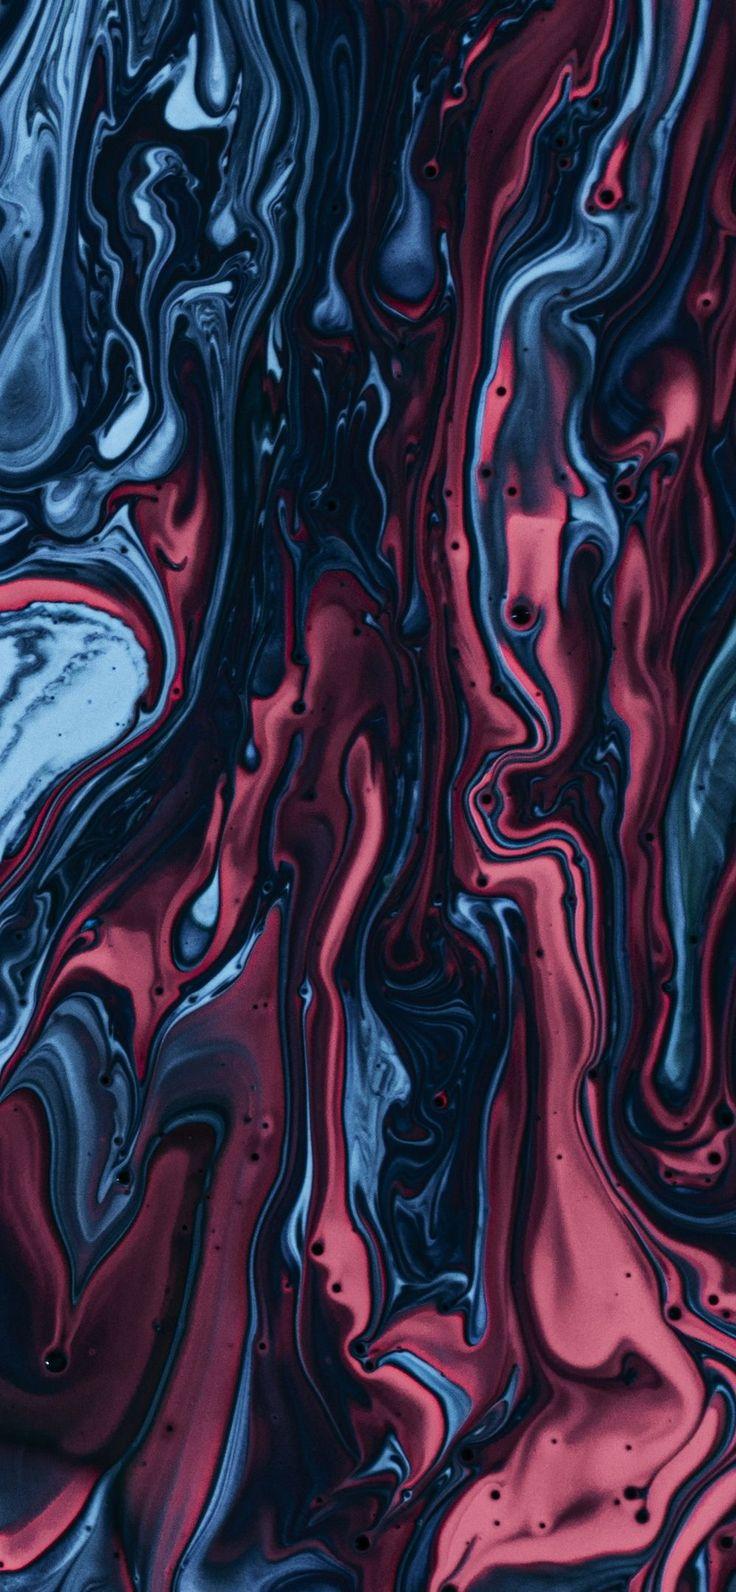 art, fluid, bright colors in 2020 Art wallpaper iphone